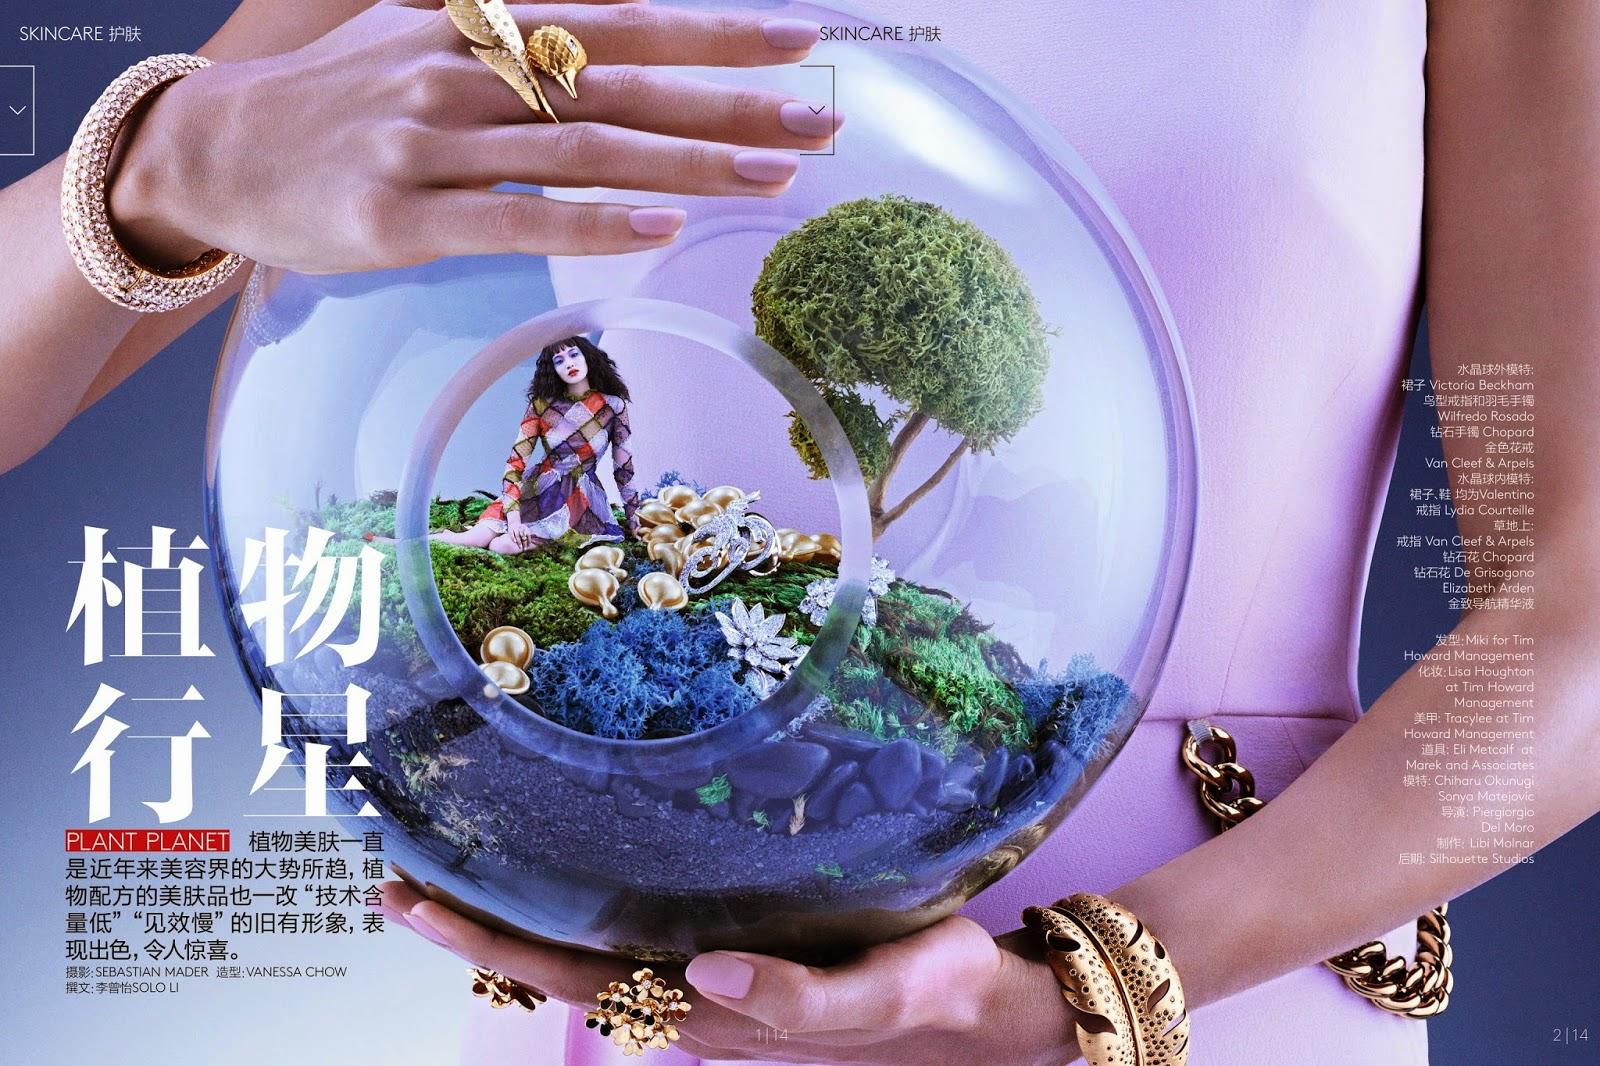 Chiharu-Okunugi-by-Sebastian-Mader-for-Vogue-China-October-2014-2